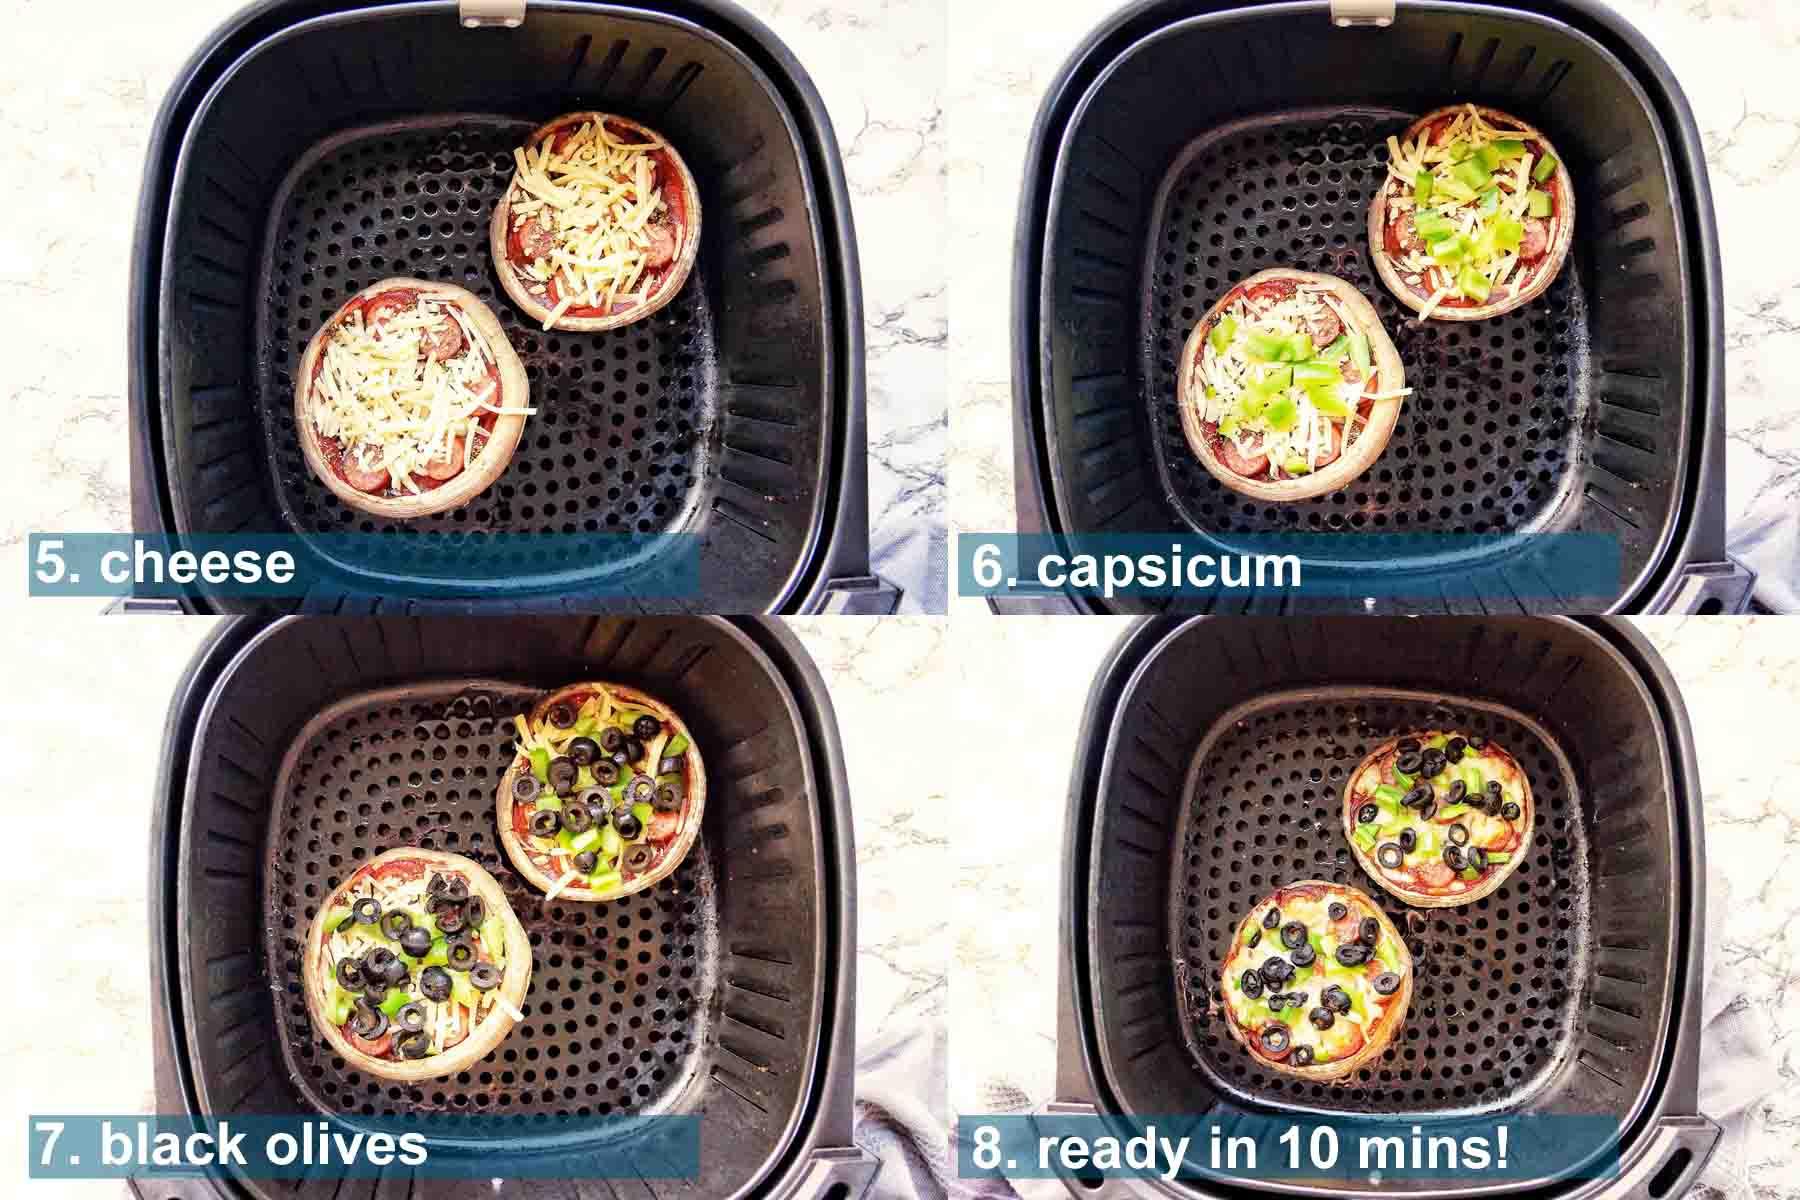 Portobello Pizza method 5 to 8